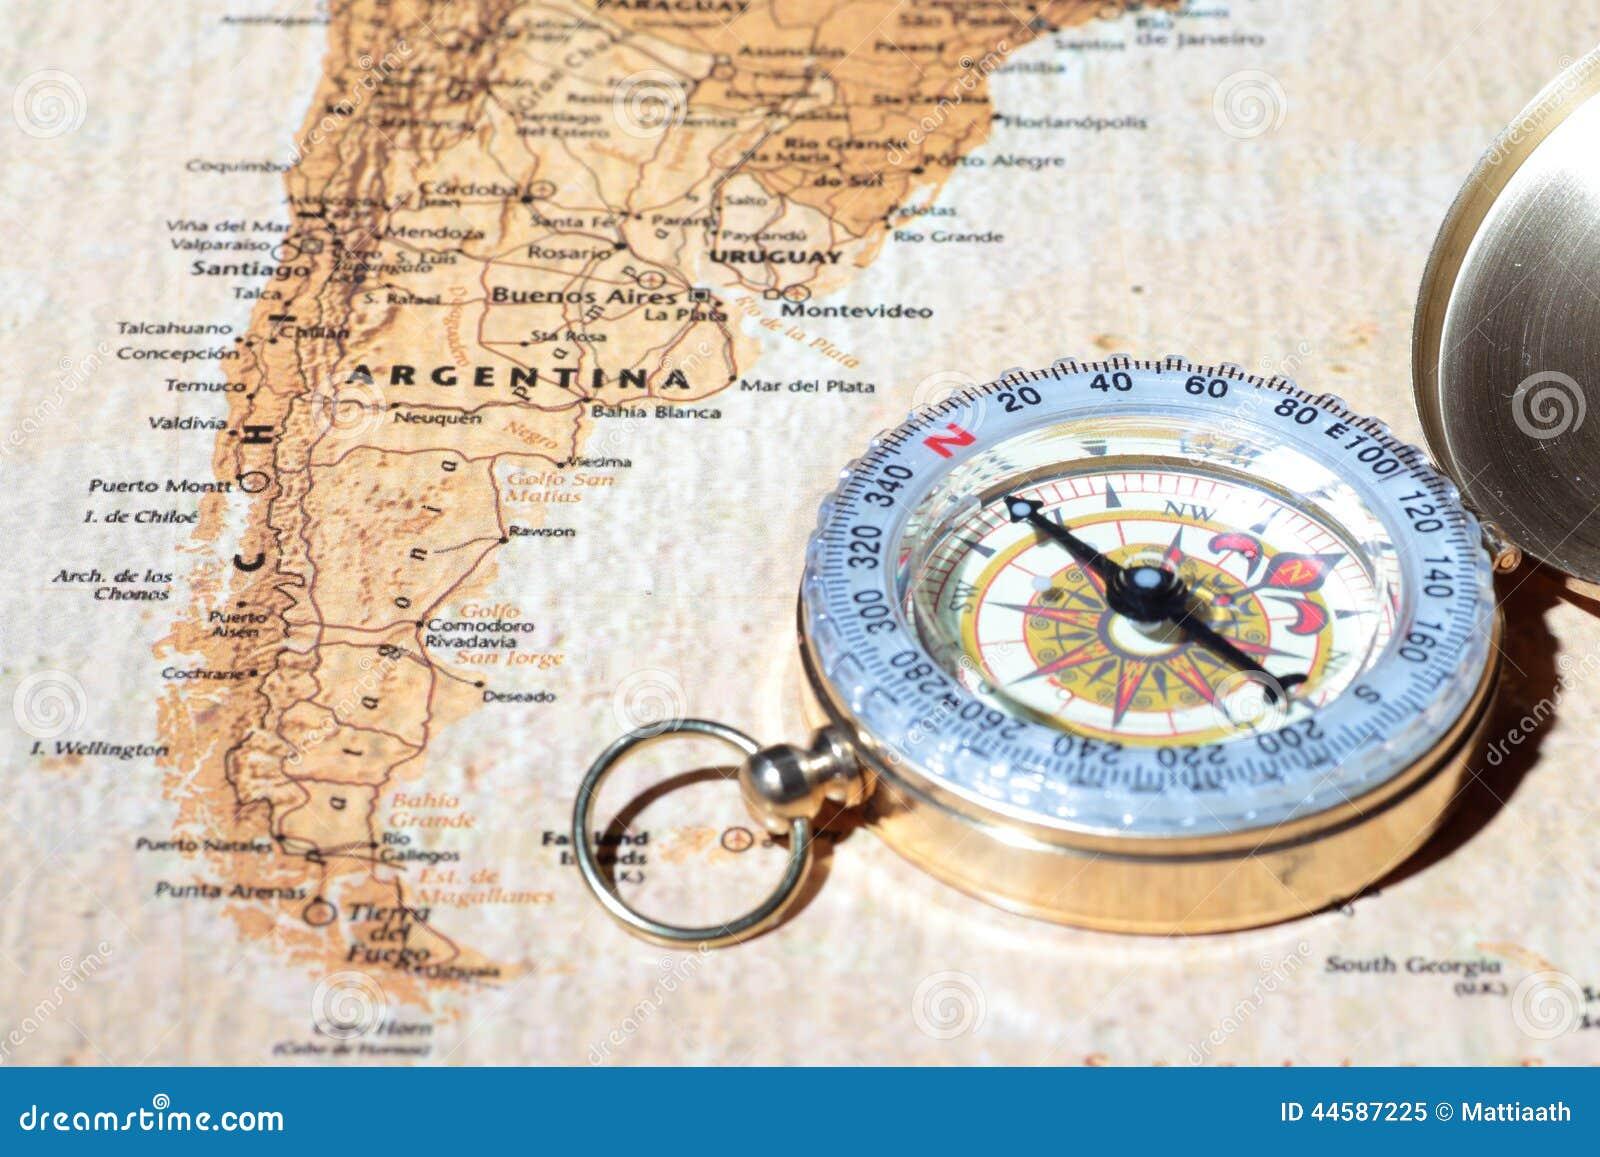 Travel Destination Argentina Ancient Map With Vintage Compass - Argentina map vintage